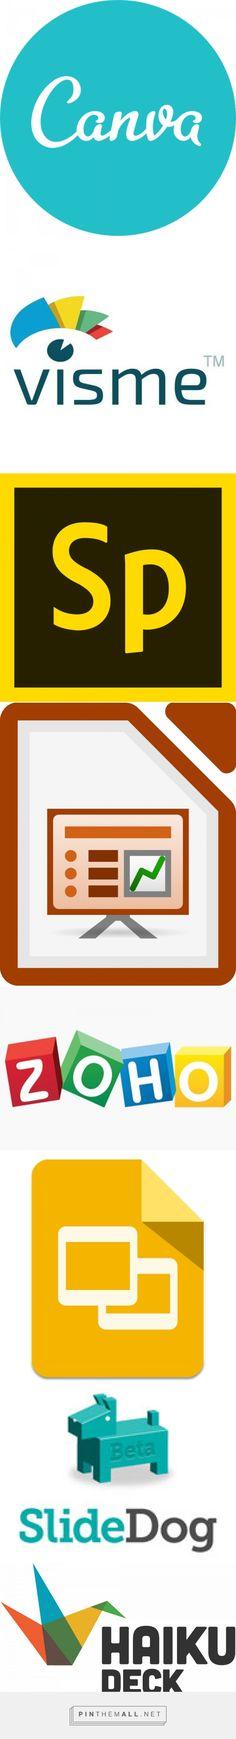 9 Free Presentation Software Alternatives Free Presentation Software, Sales And Marketing, Haiku, Alternative